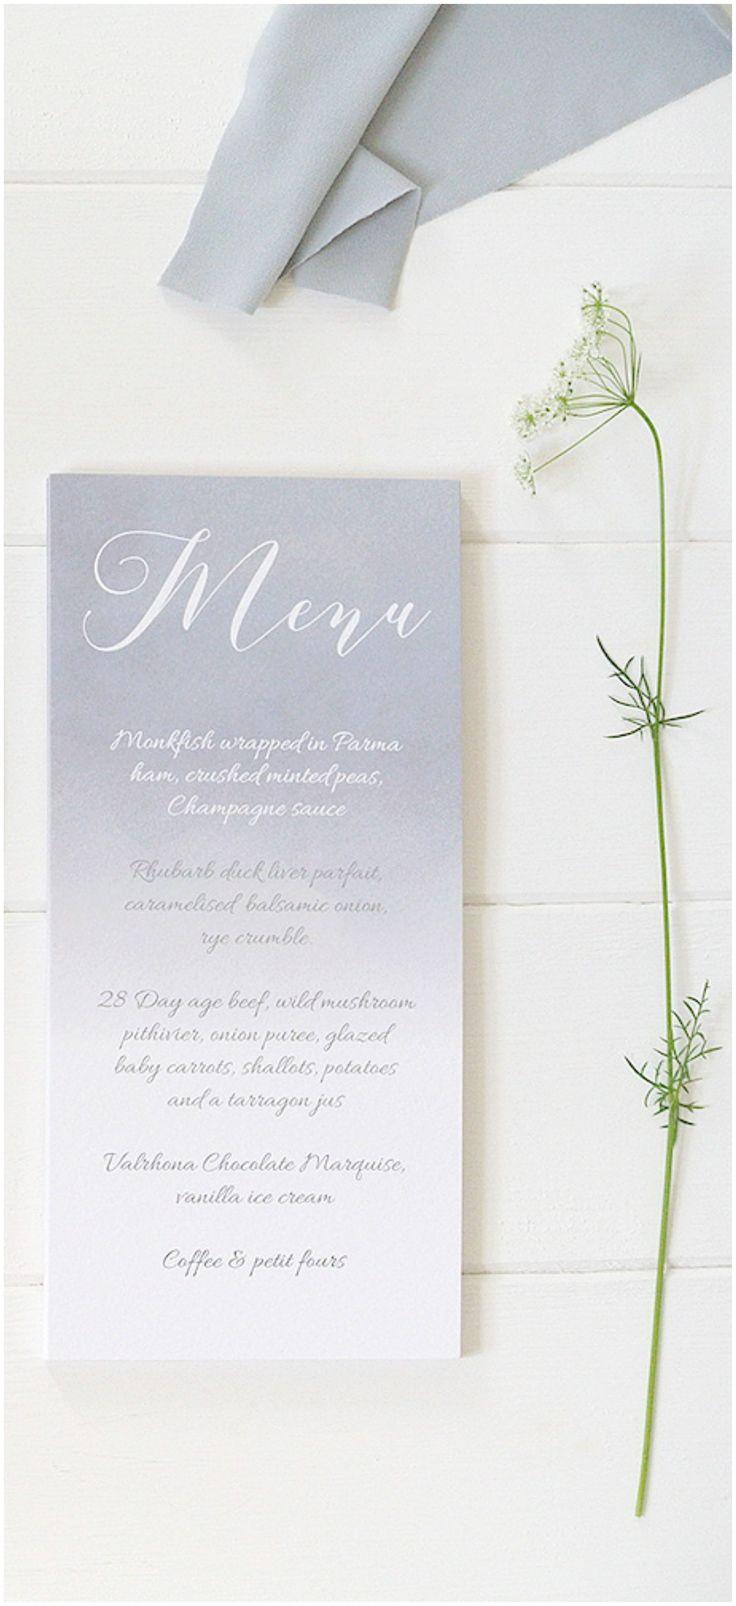 Blue-grey watercolour wedding breakfast menu by peonyandrose.co.uk